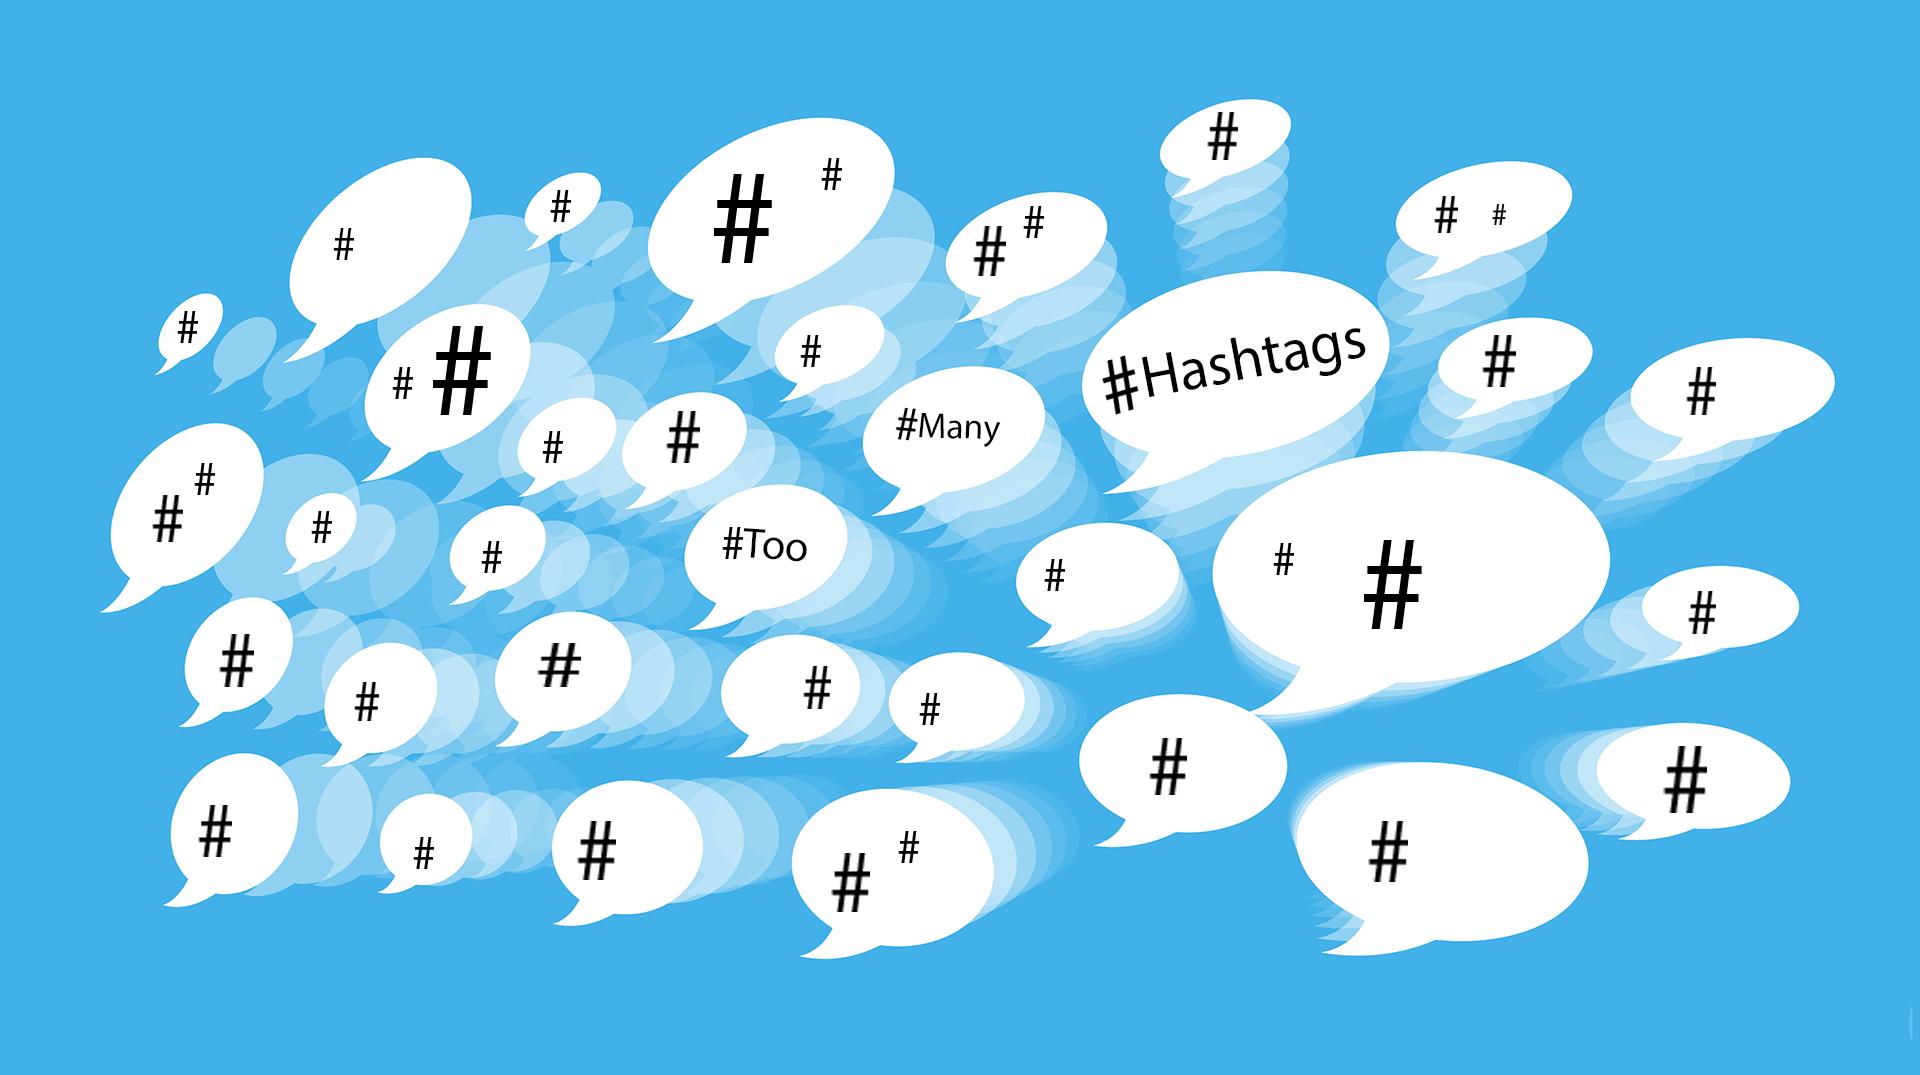 Ini sejarah simbol # atau hashtag yang sering kamu pencet tiap hari